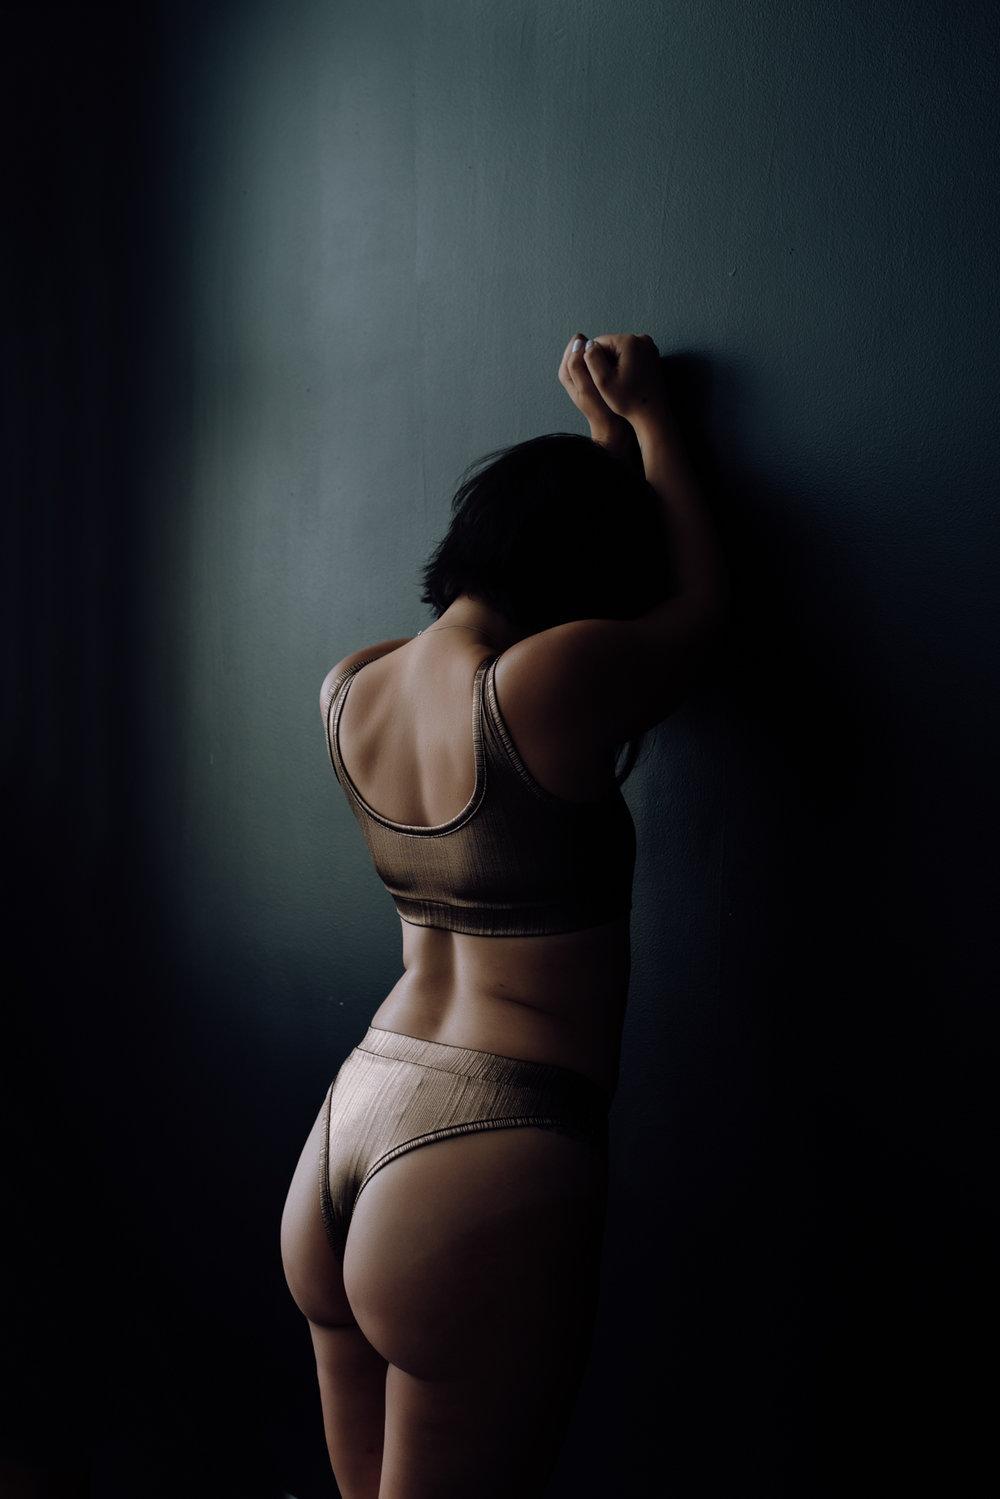 berks county best boudoir photography-18.jpg